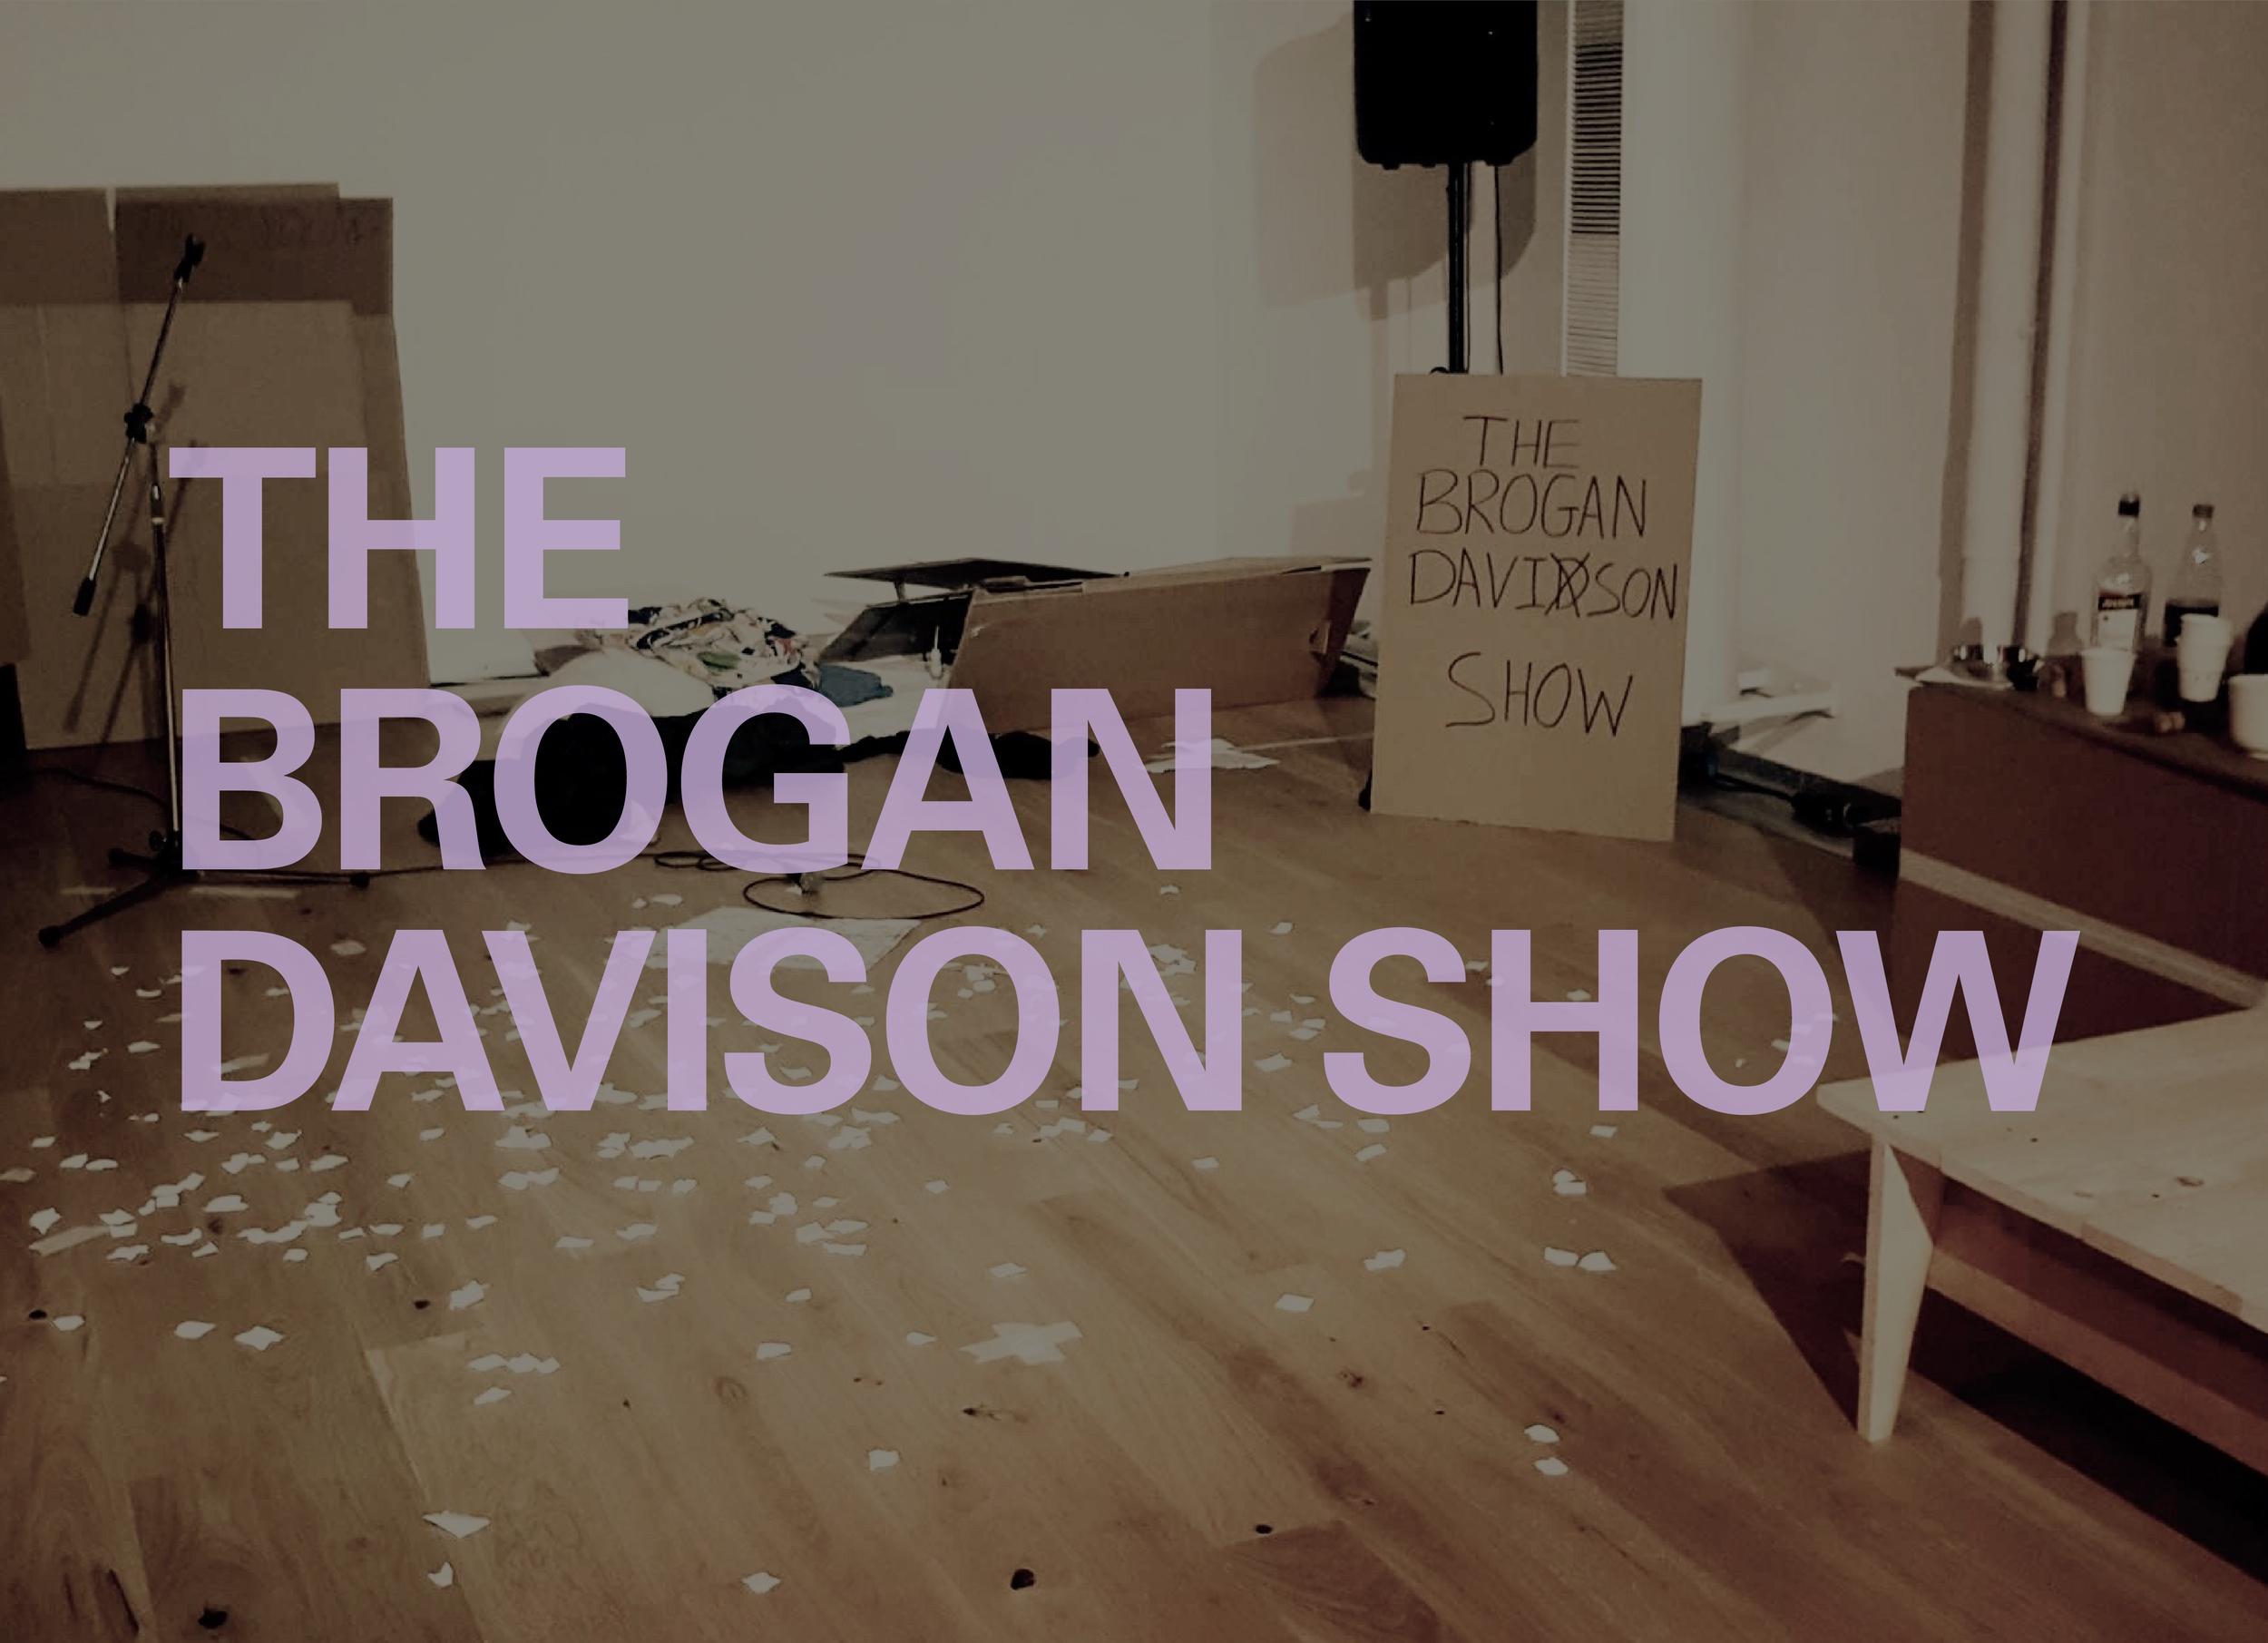 brogandavisonshow.png